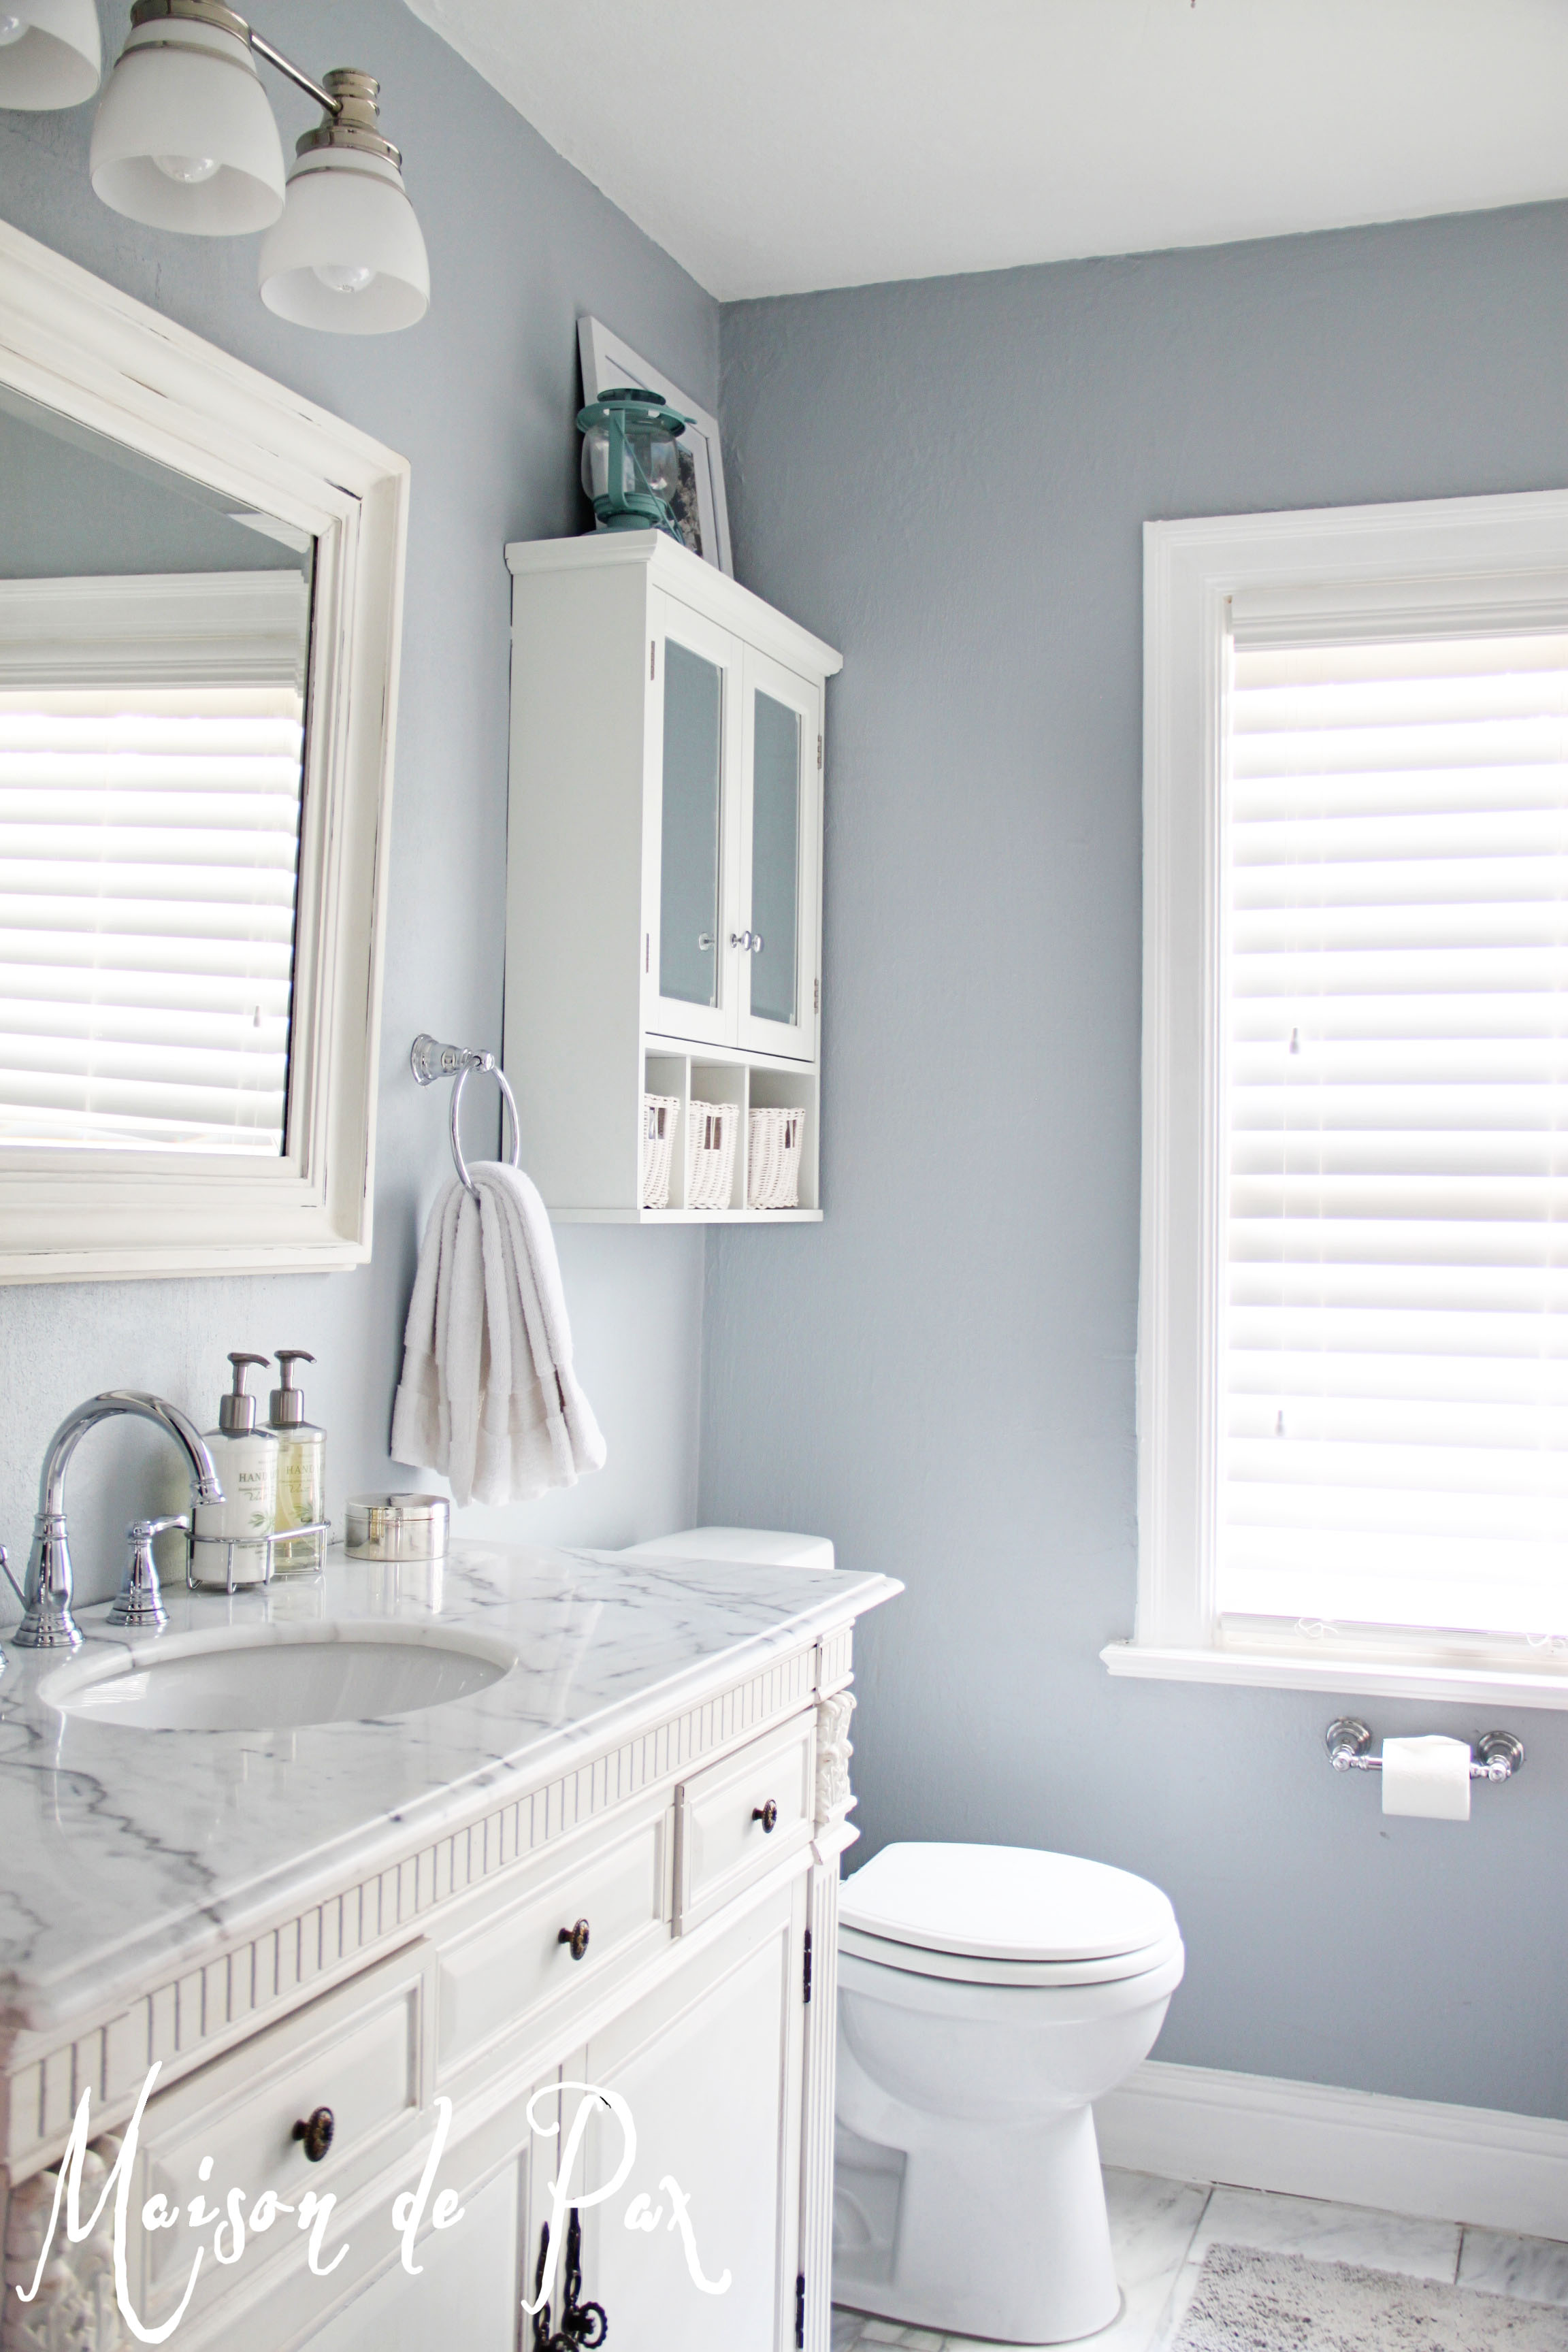 12 Inspiring Bathroom Makeovers  House by Hoff